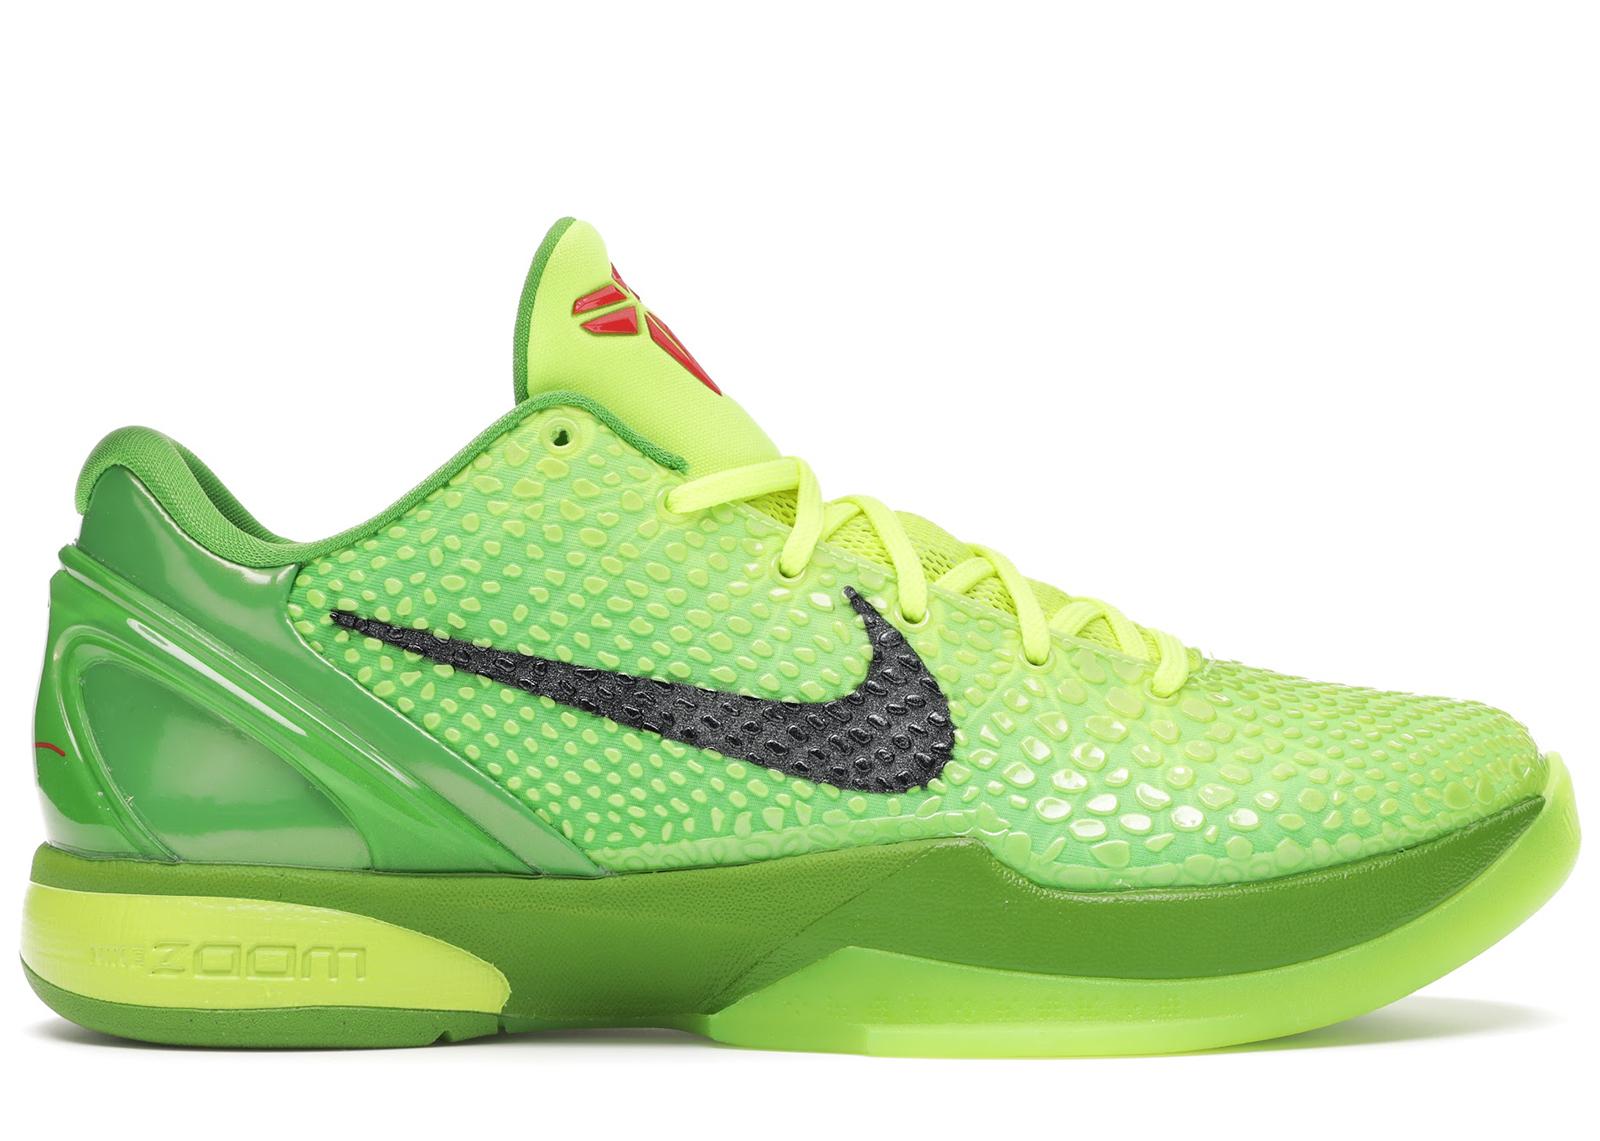 Nike Kobe 6 Protro Grinch (2020) - CW2190-300